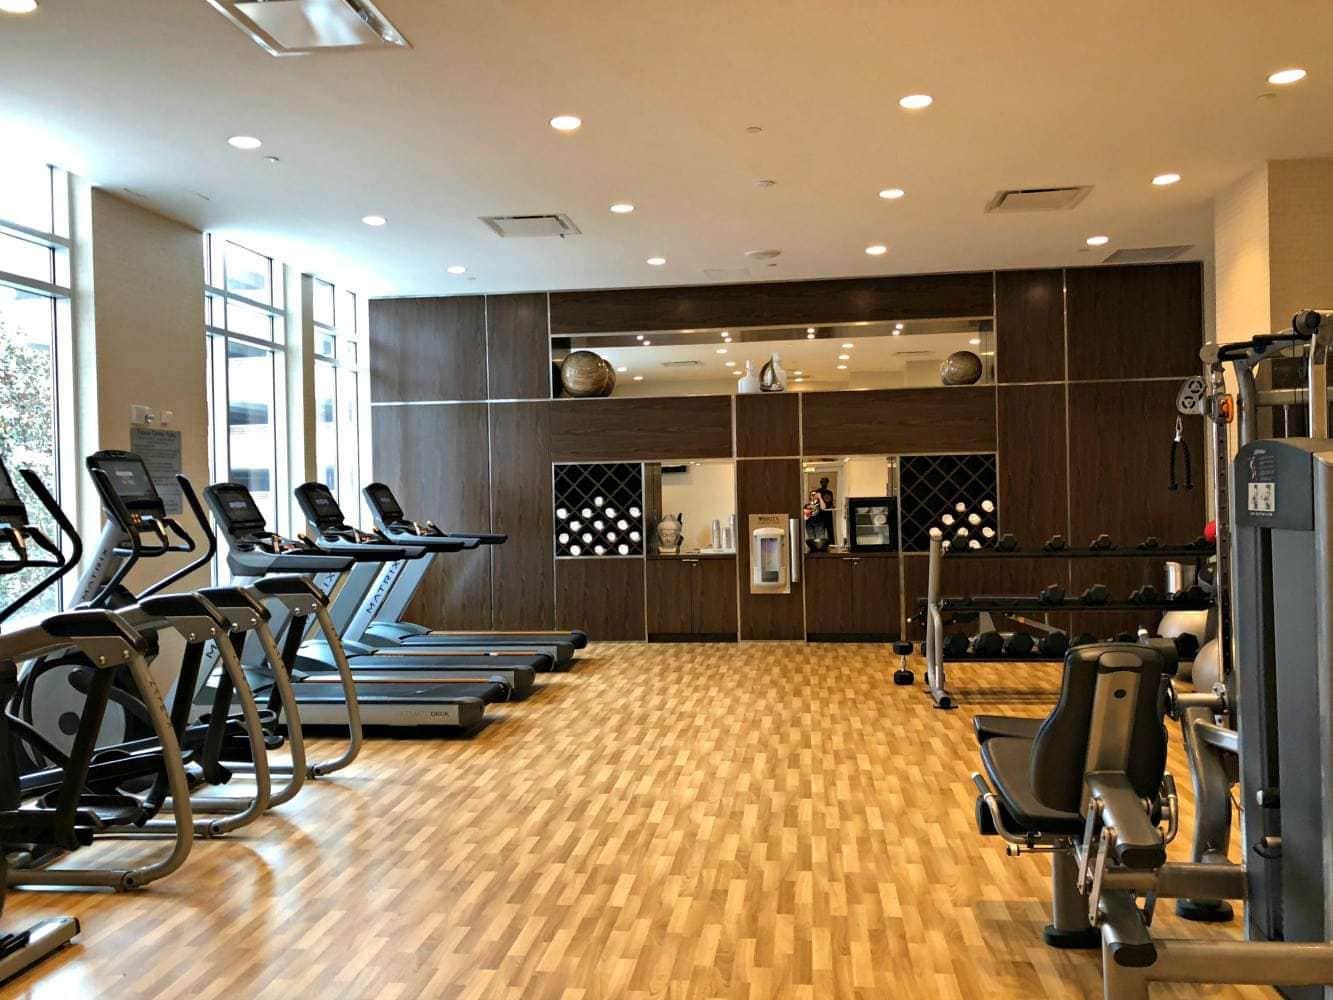 ac hotel national harbor gym